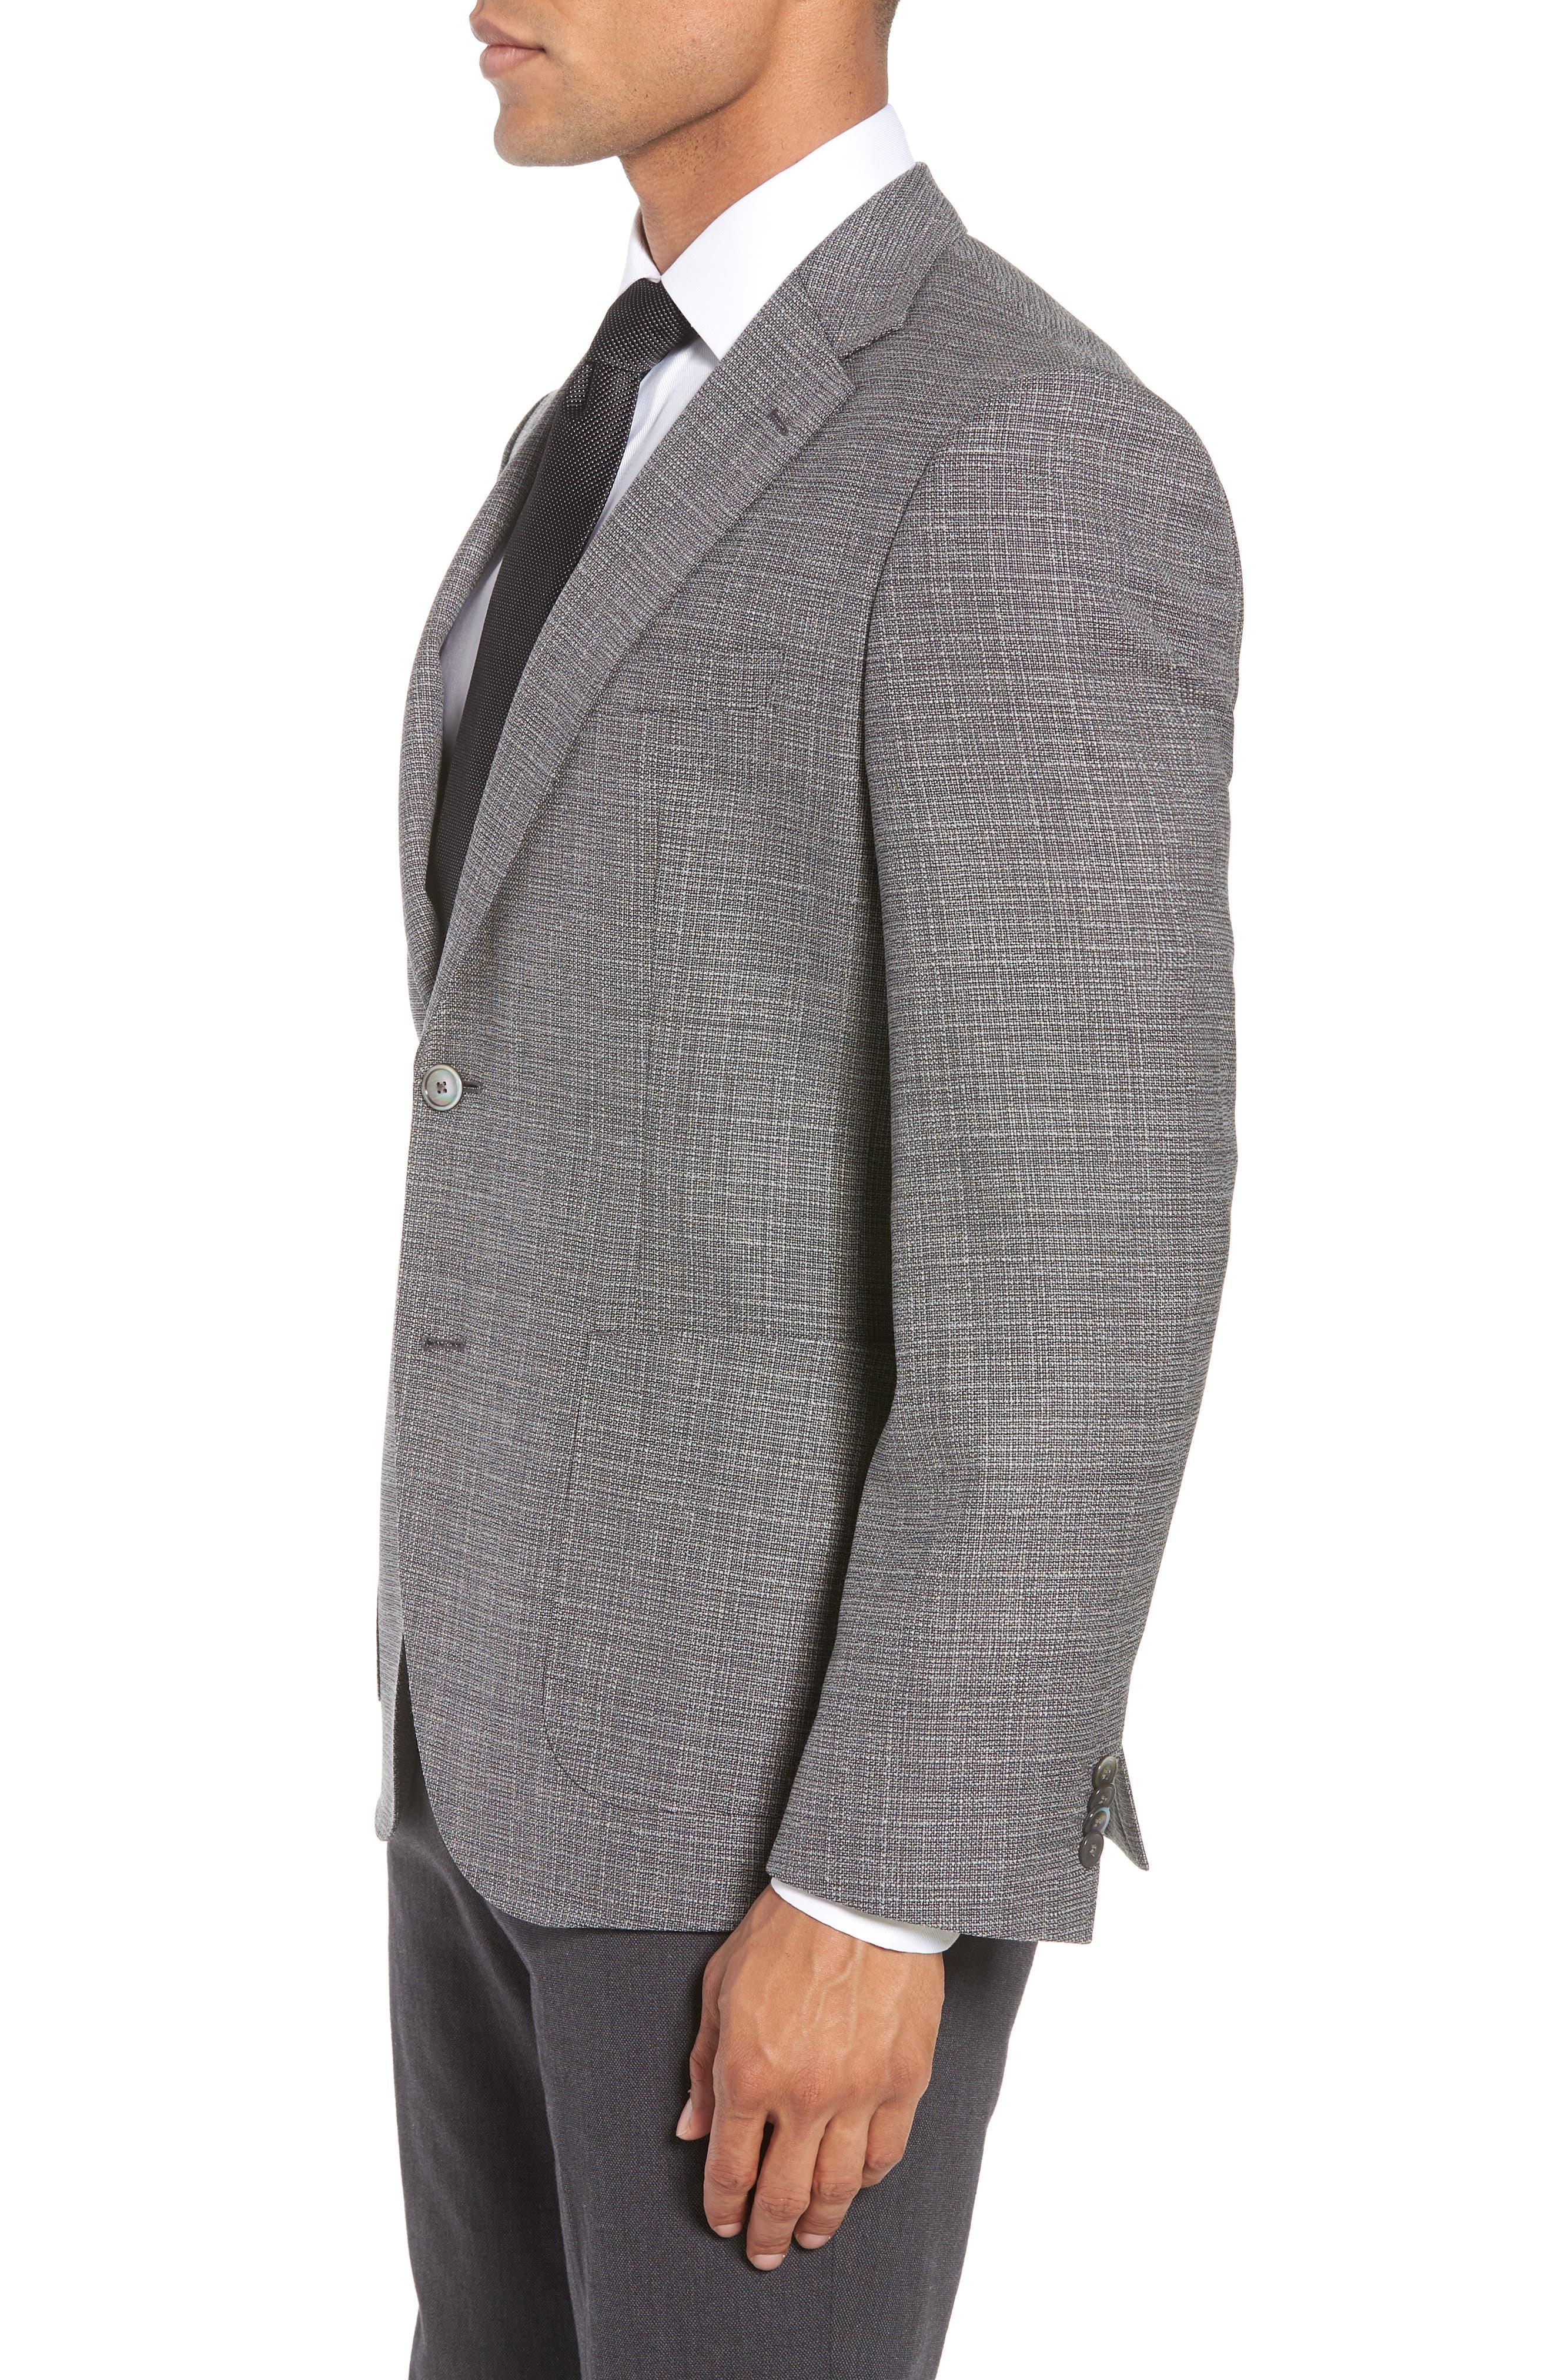 BOSS, Janson Classic Fit Wool Blazer, Alternate thumbnail 3, color, GREY